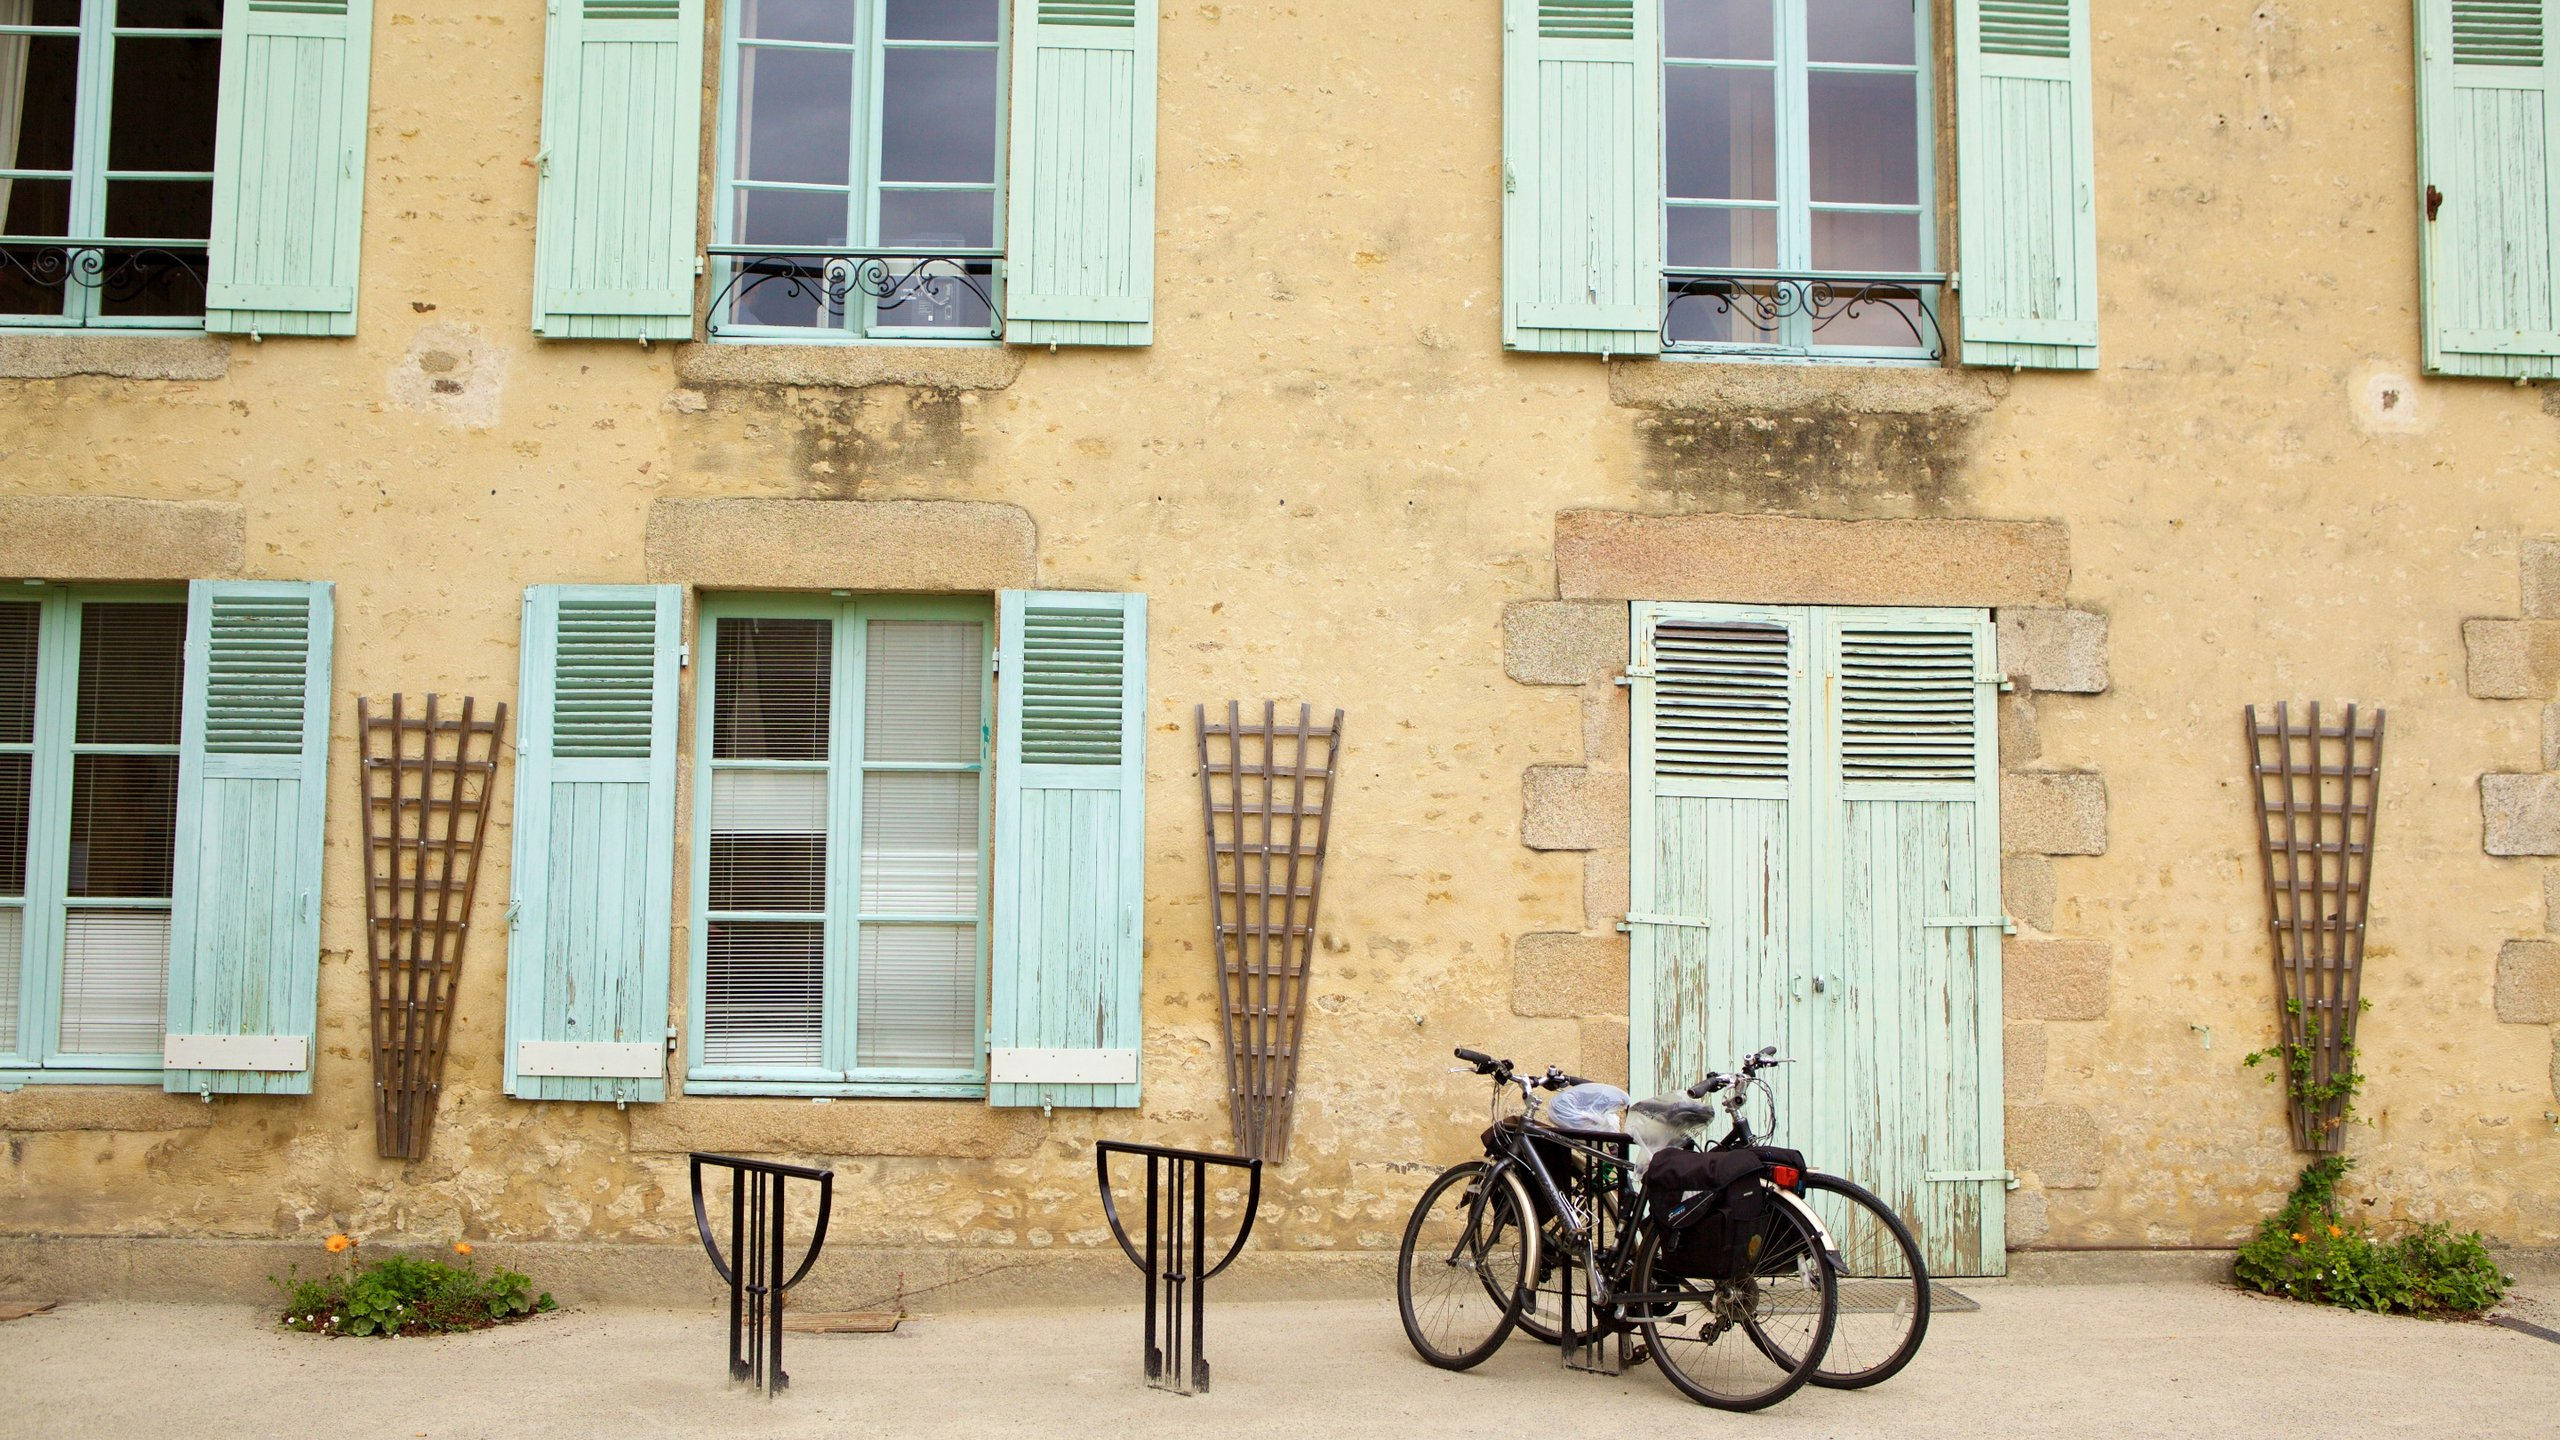 Orne (departamento), Francia